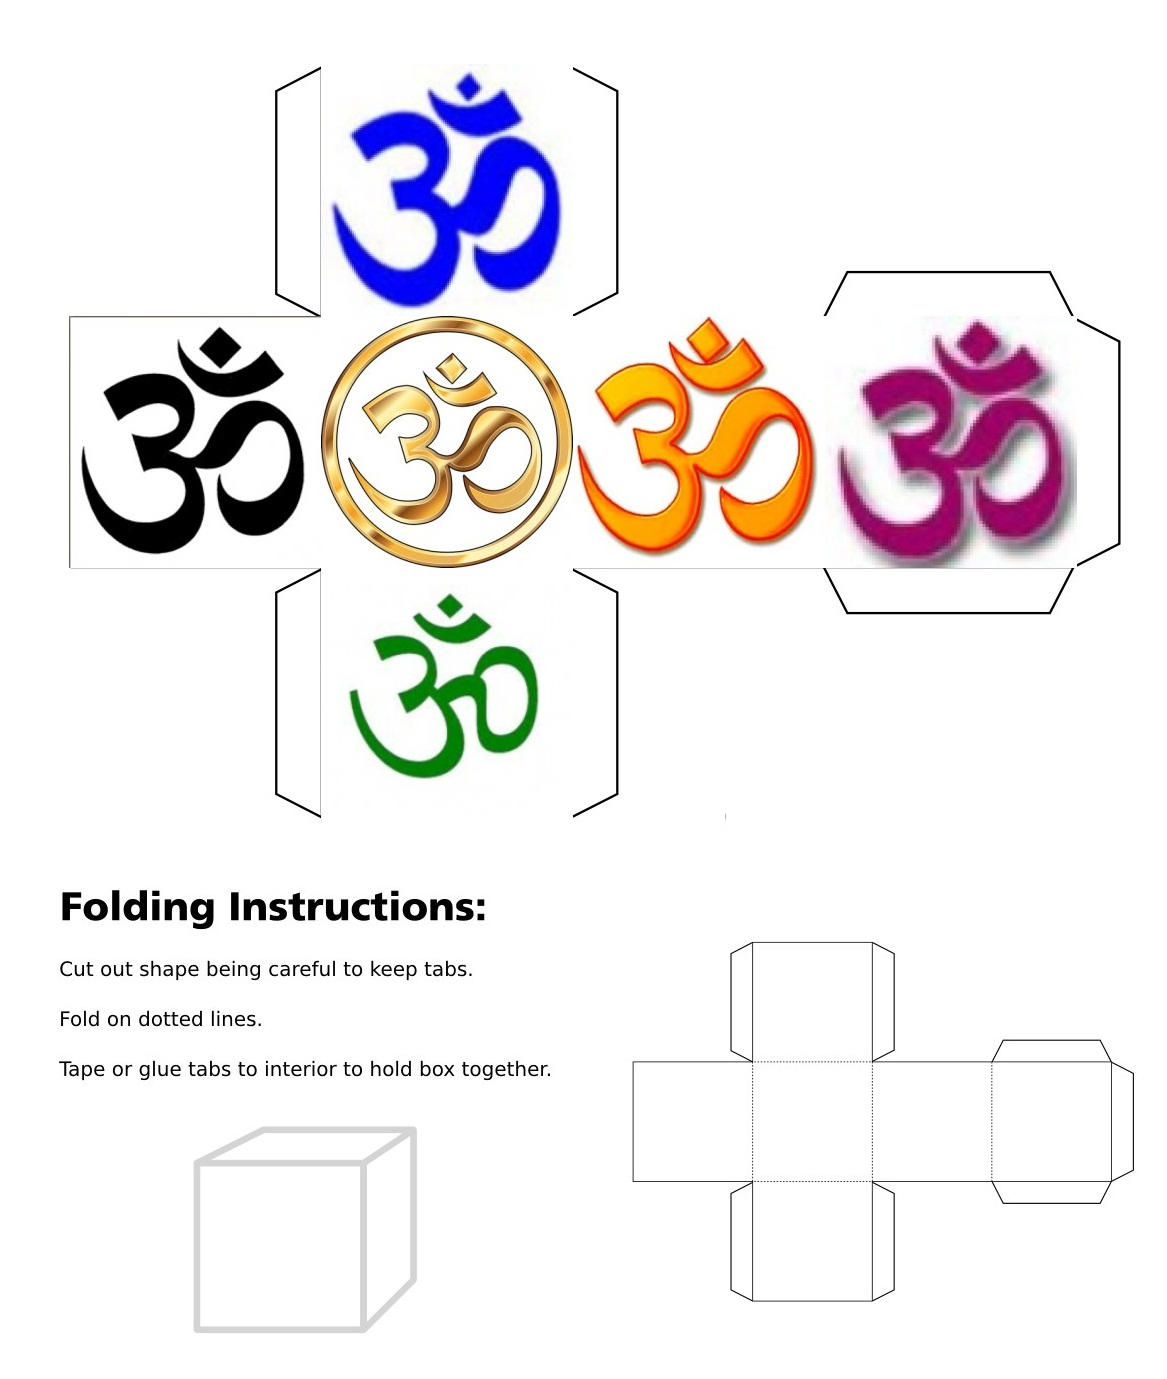 cube, 3d cube, Om symbol, black om, blue om, gold om, green om, orange om, purple om, red om, Pink Om, white om, yellow om, collage, good luck, Hindu, silver om, banner, mandala